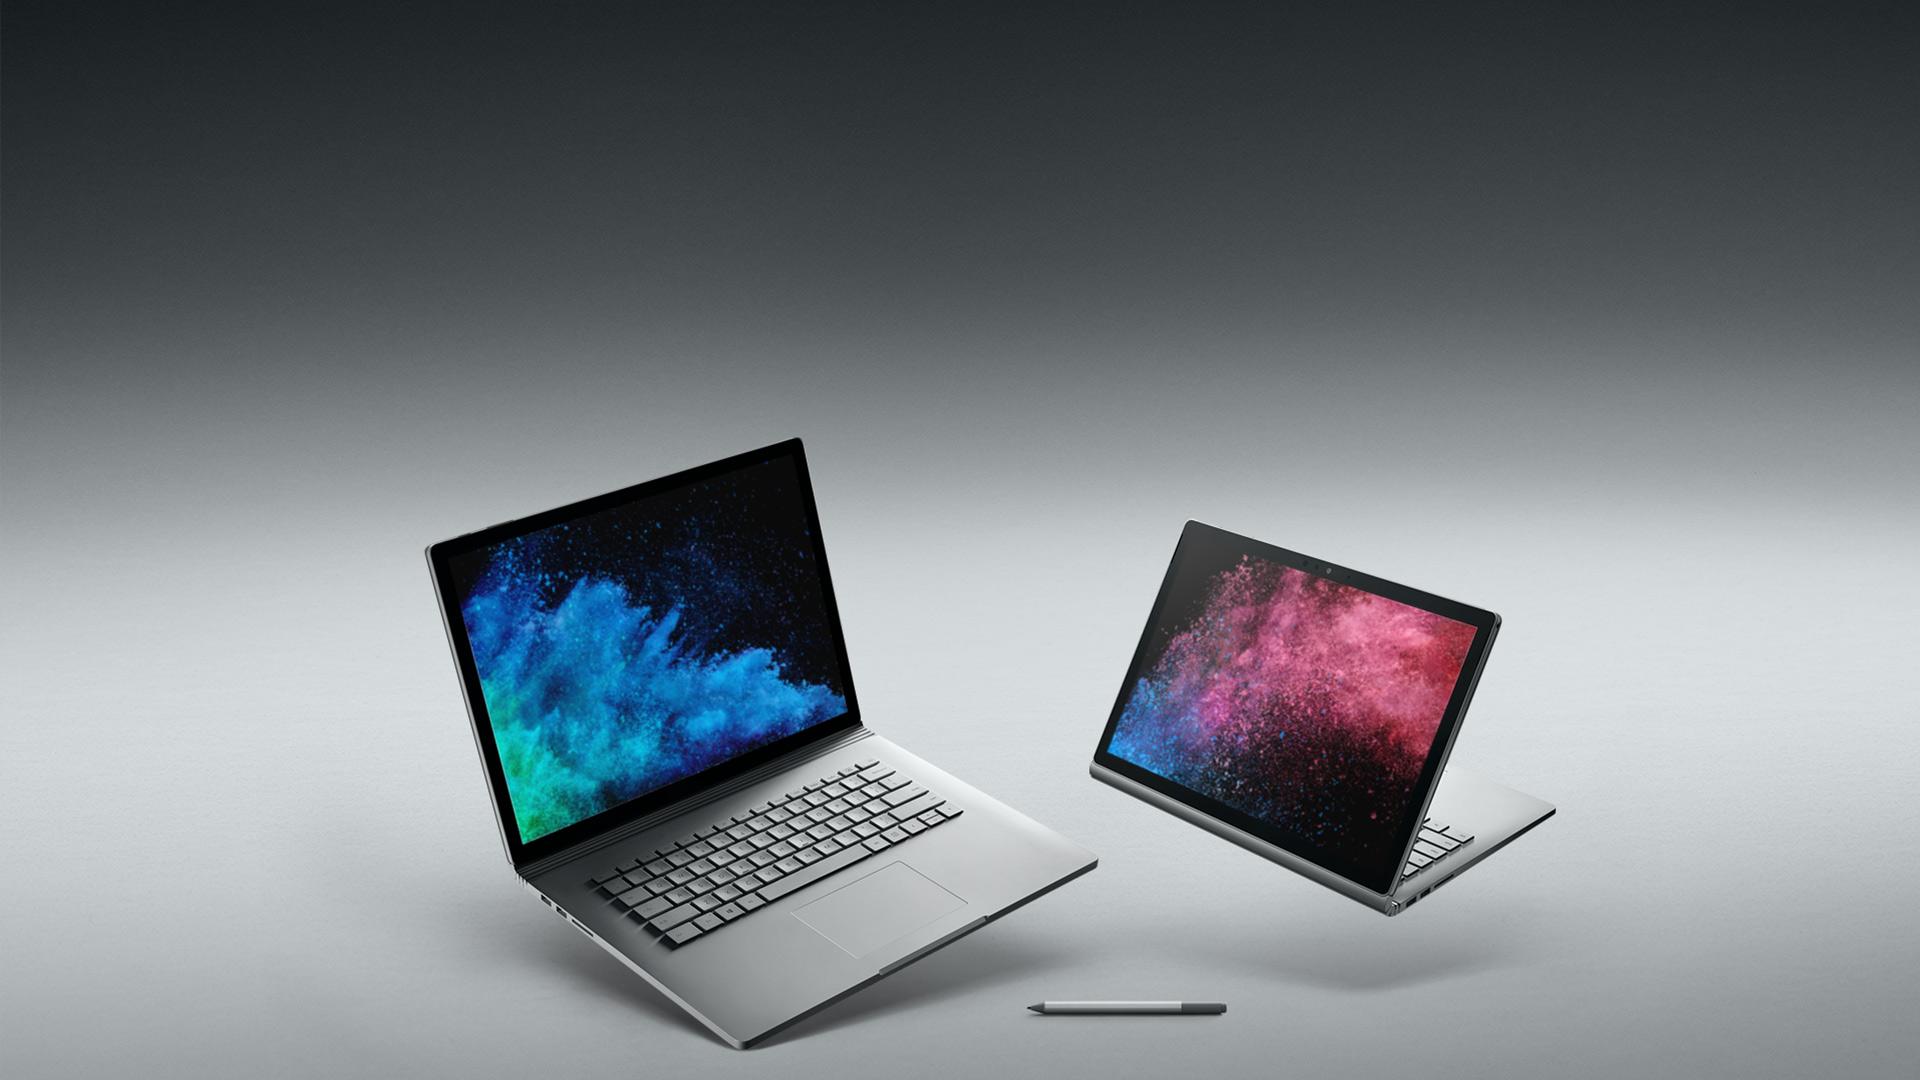 جهاز Surface Book 2 بحجم 15 بوصة، وجهاز Surface Book 2